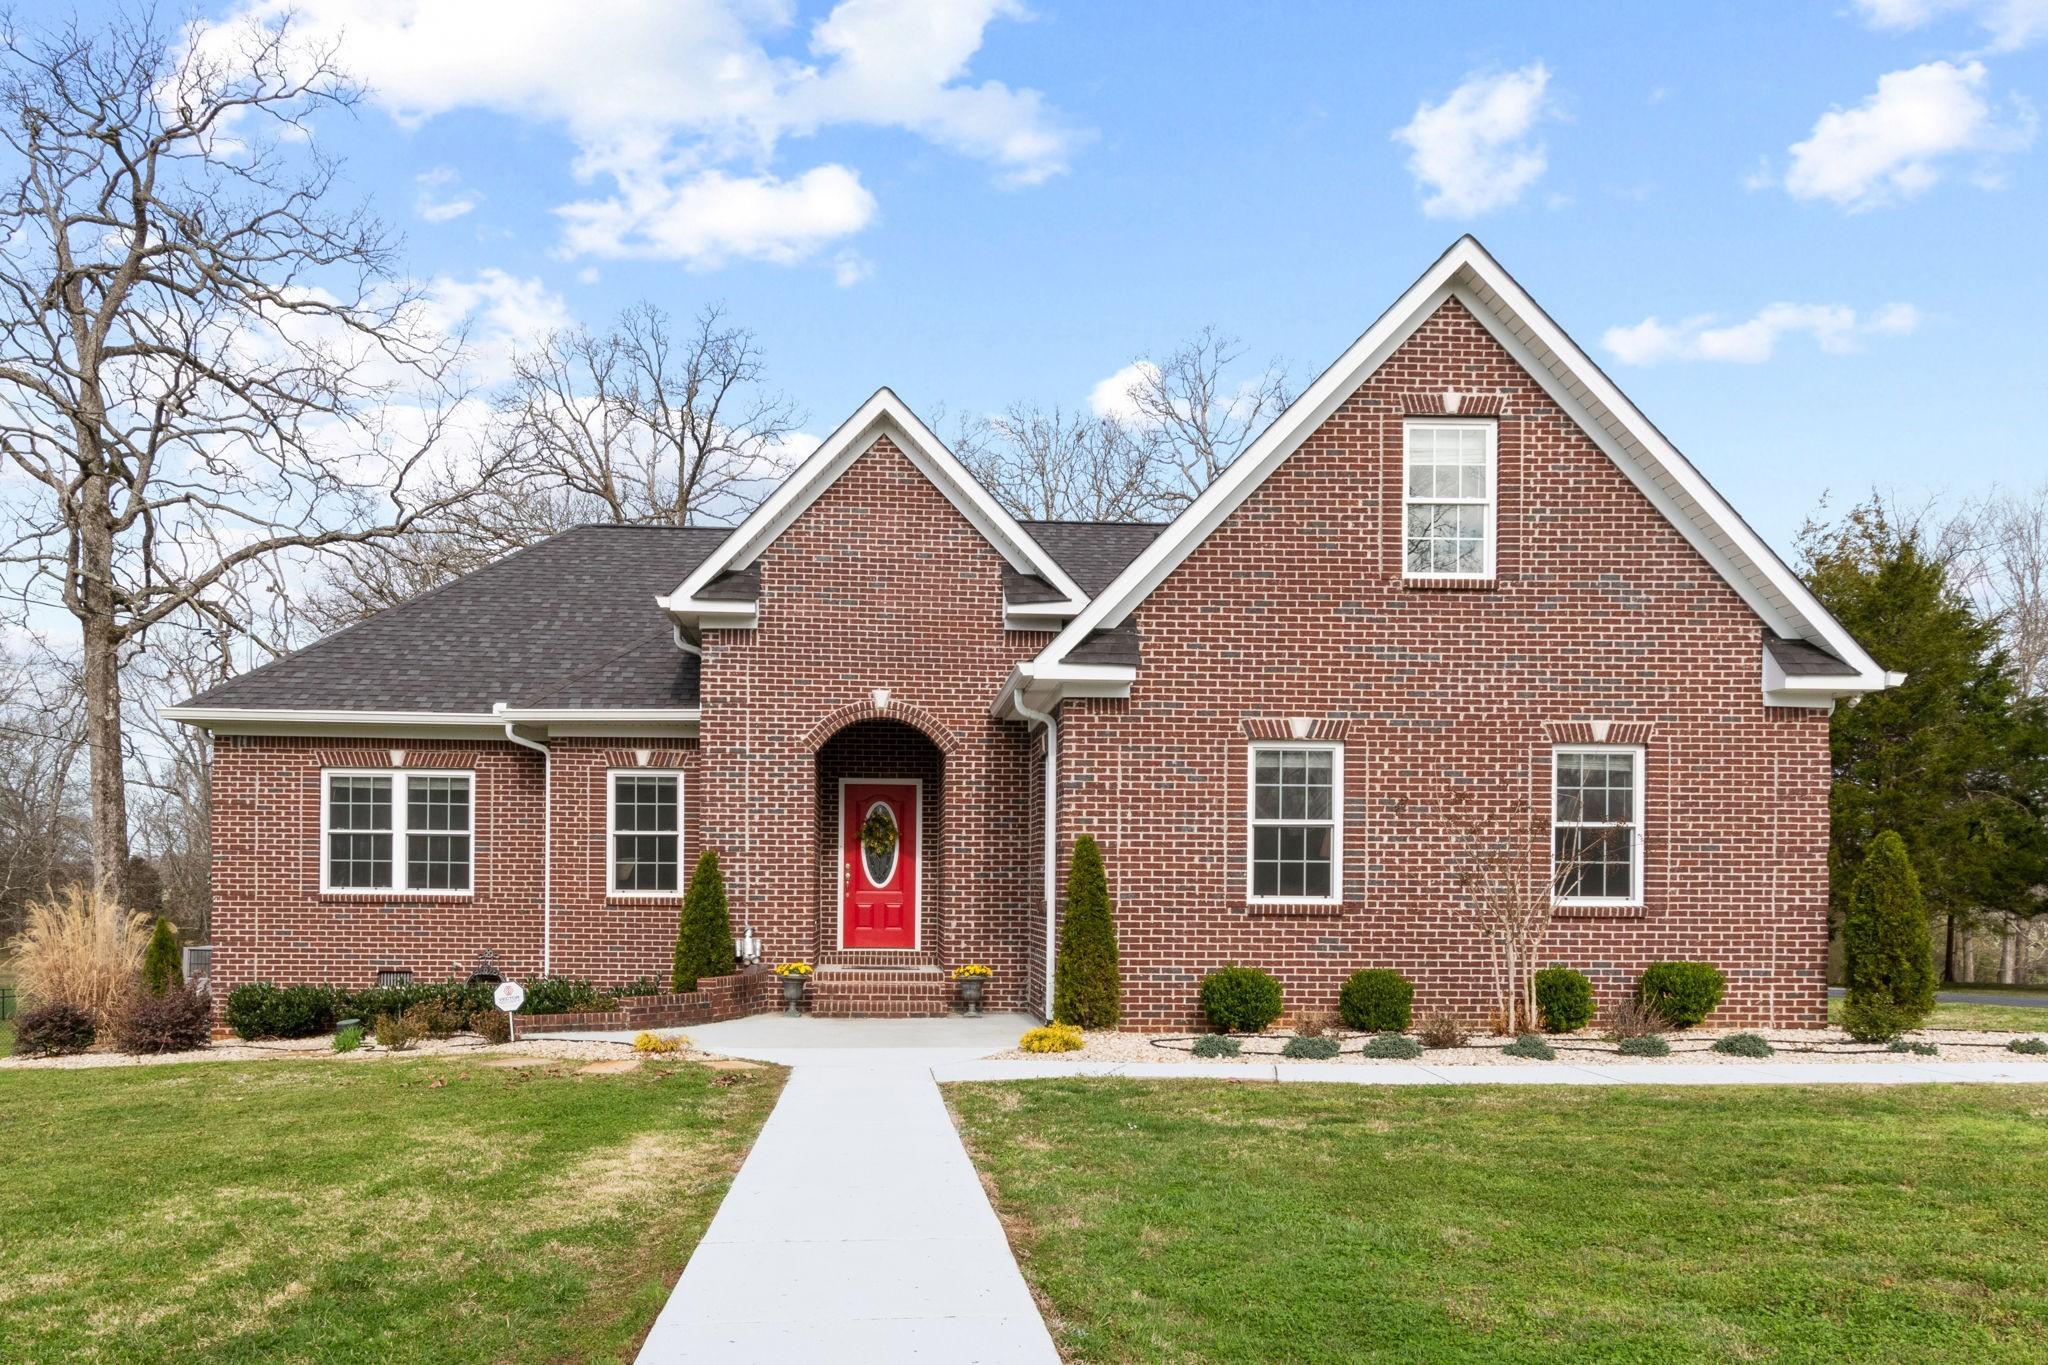 203 Richland Dr Property Photo - Shelbyville, TN real estate listing